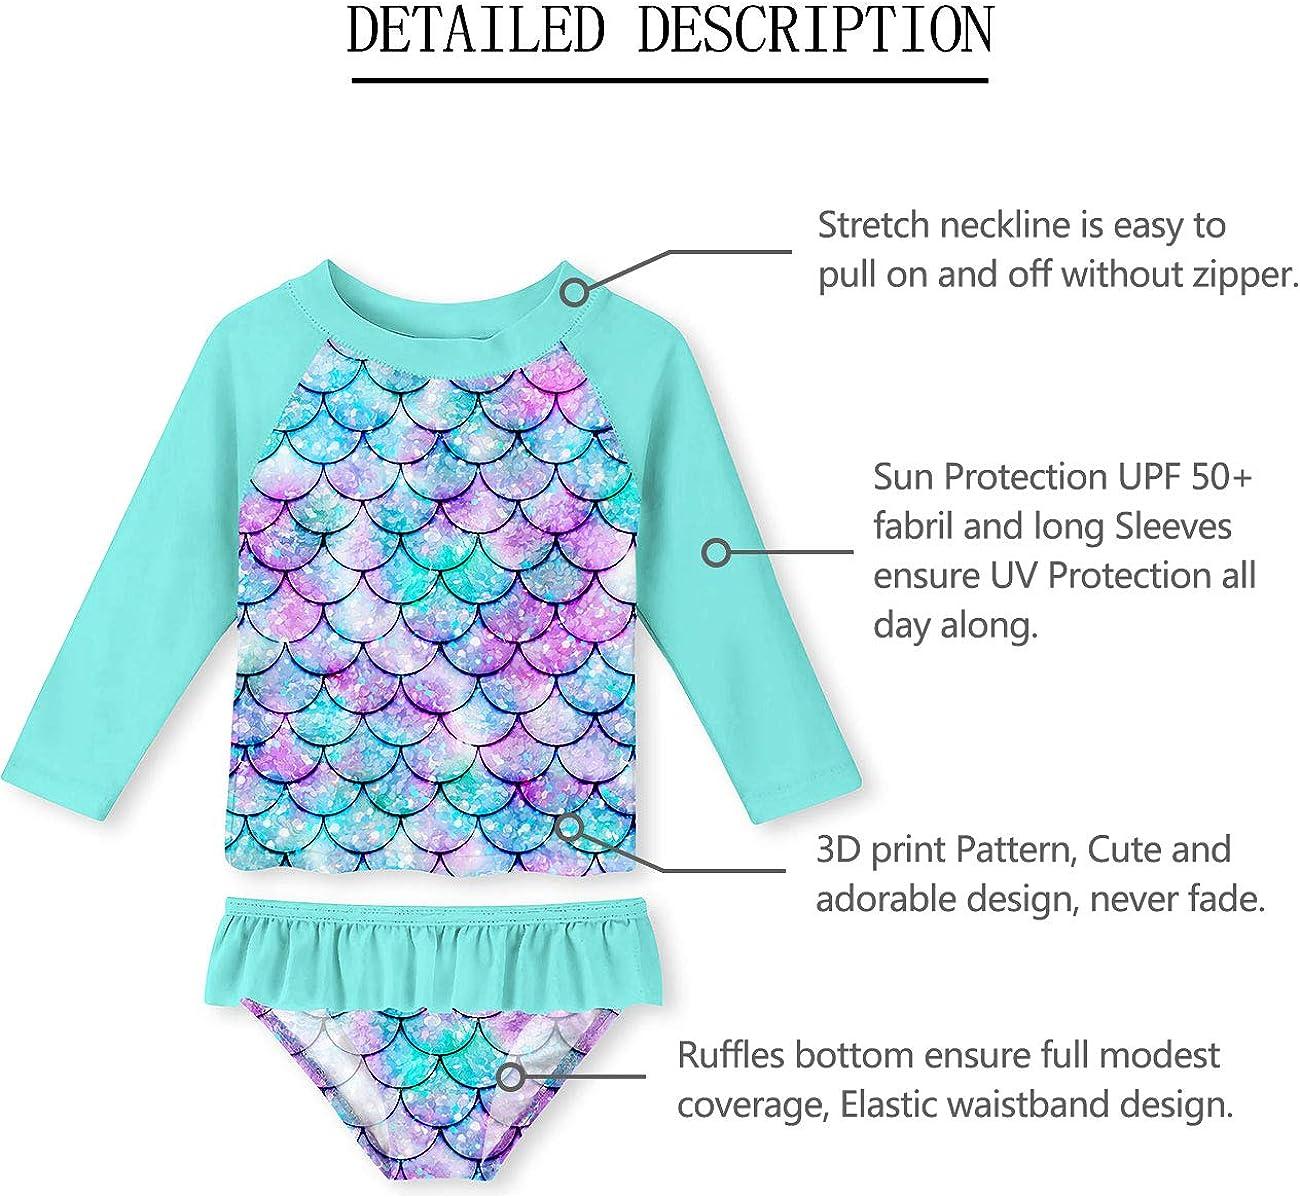 Sun Protection 2-8T UNIFACO Toddler Girls Swimsuit Rashguard Set Summer Beach Breathable Tankini with UPF 50